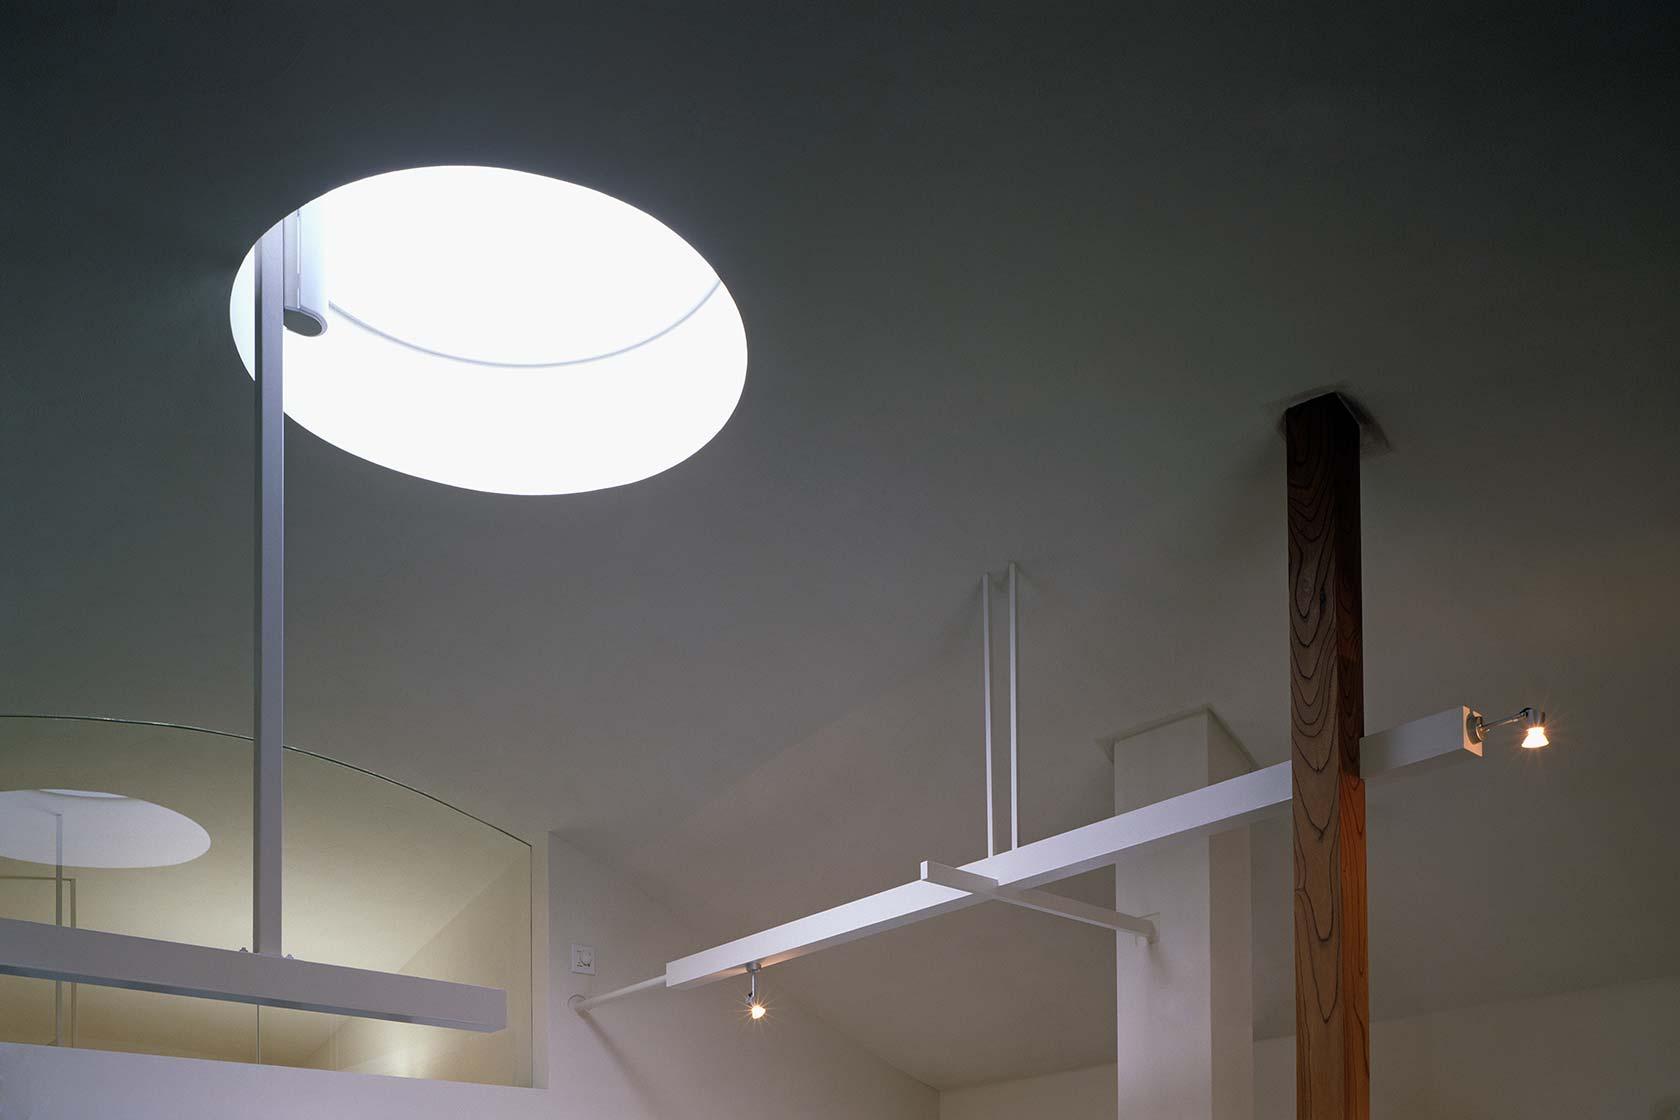 K織物株式会社+K邸33-リビング天井のトップライト